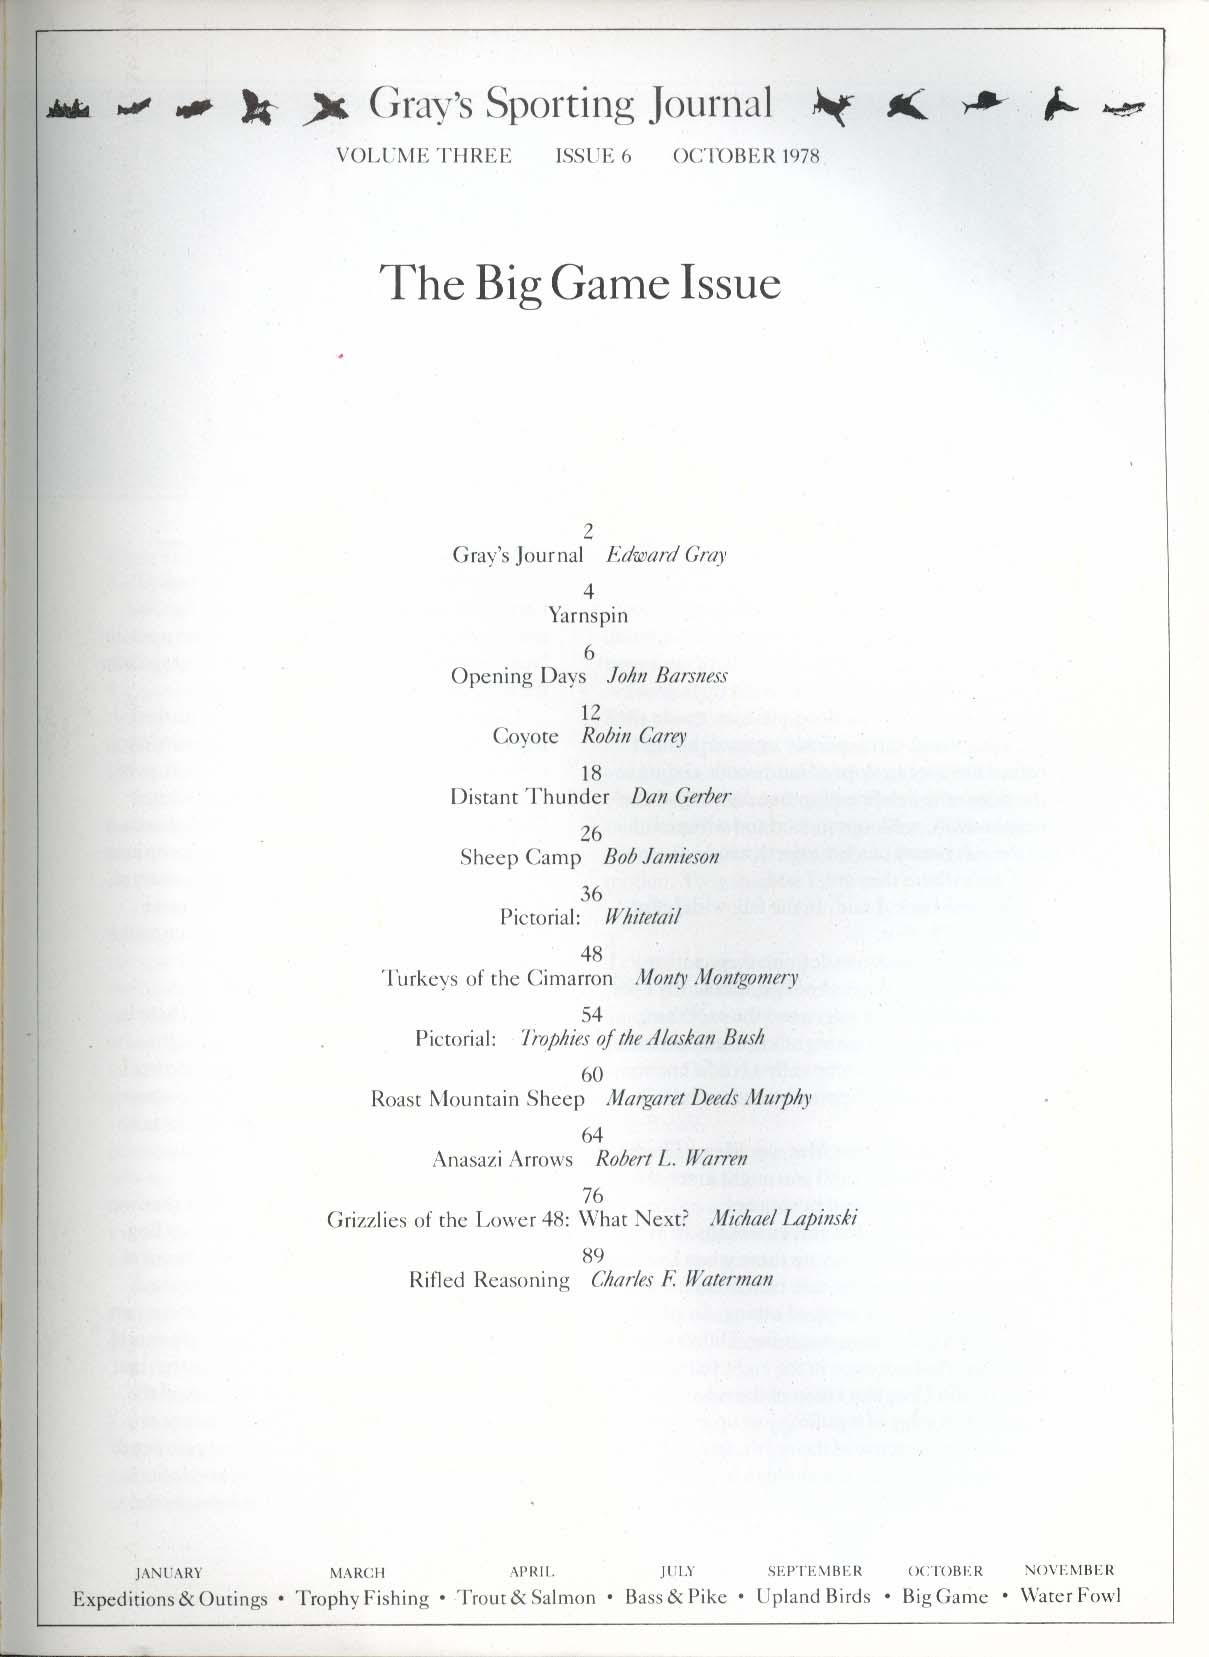 GRAY'S SPORTING JOURNAL Vol 3 #6 Big Game Coyote Turkey of Cimarron 10 1978